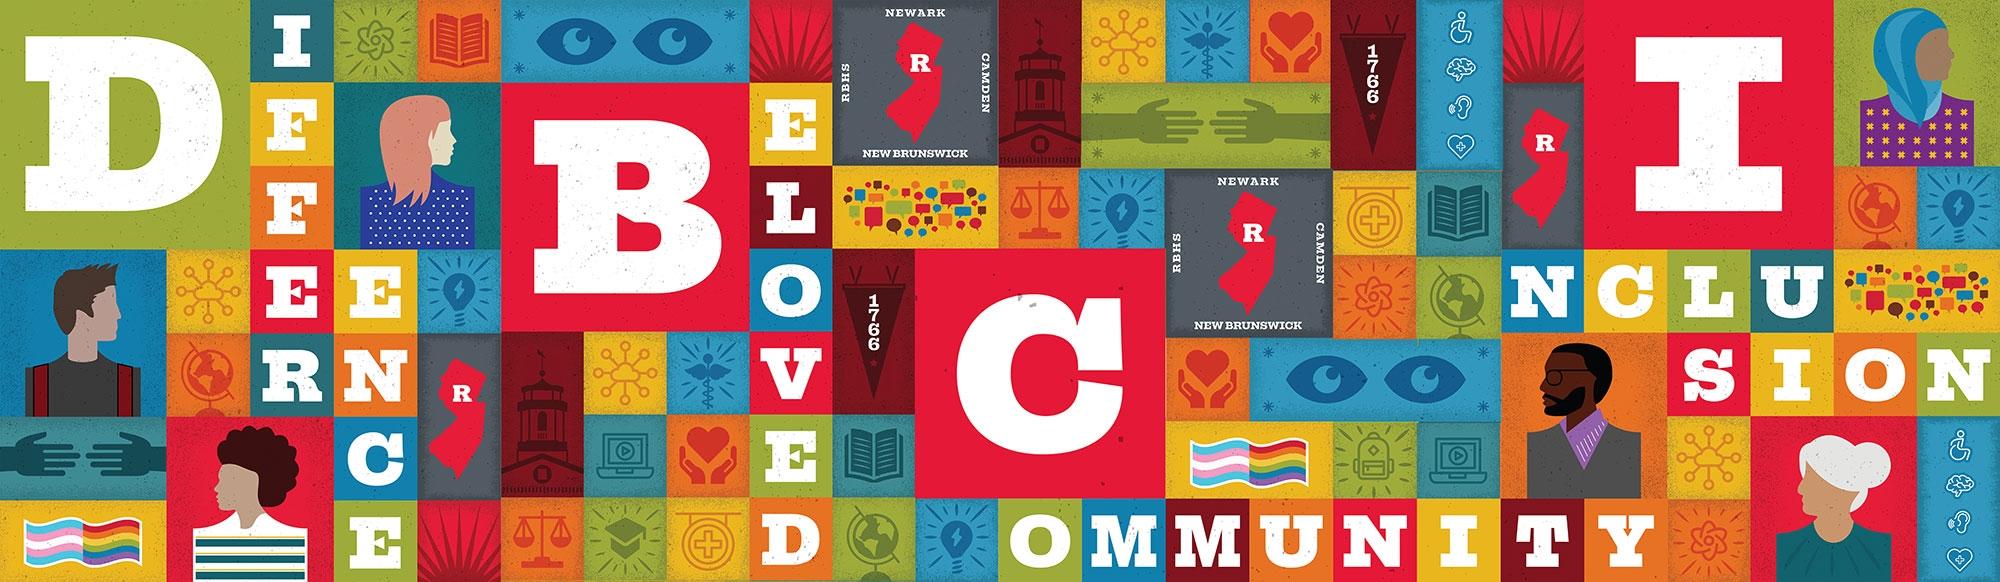 beloved community graphic image